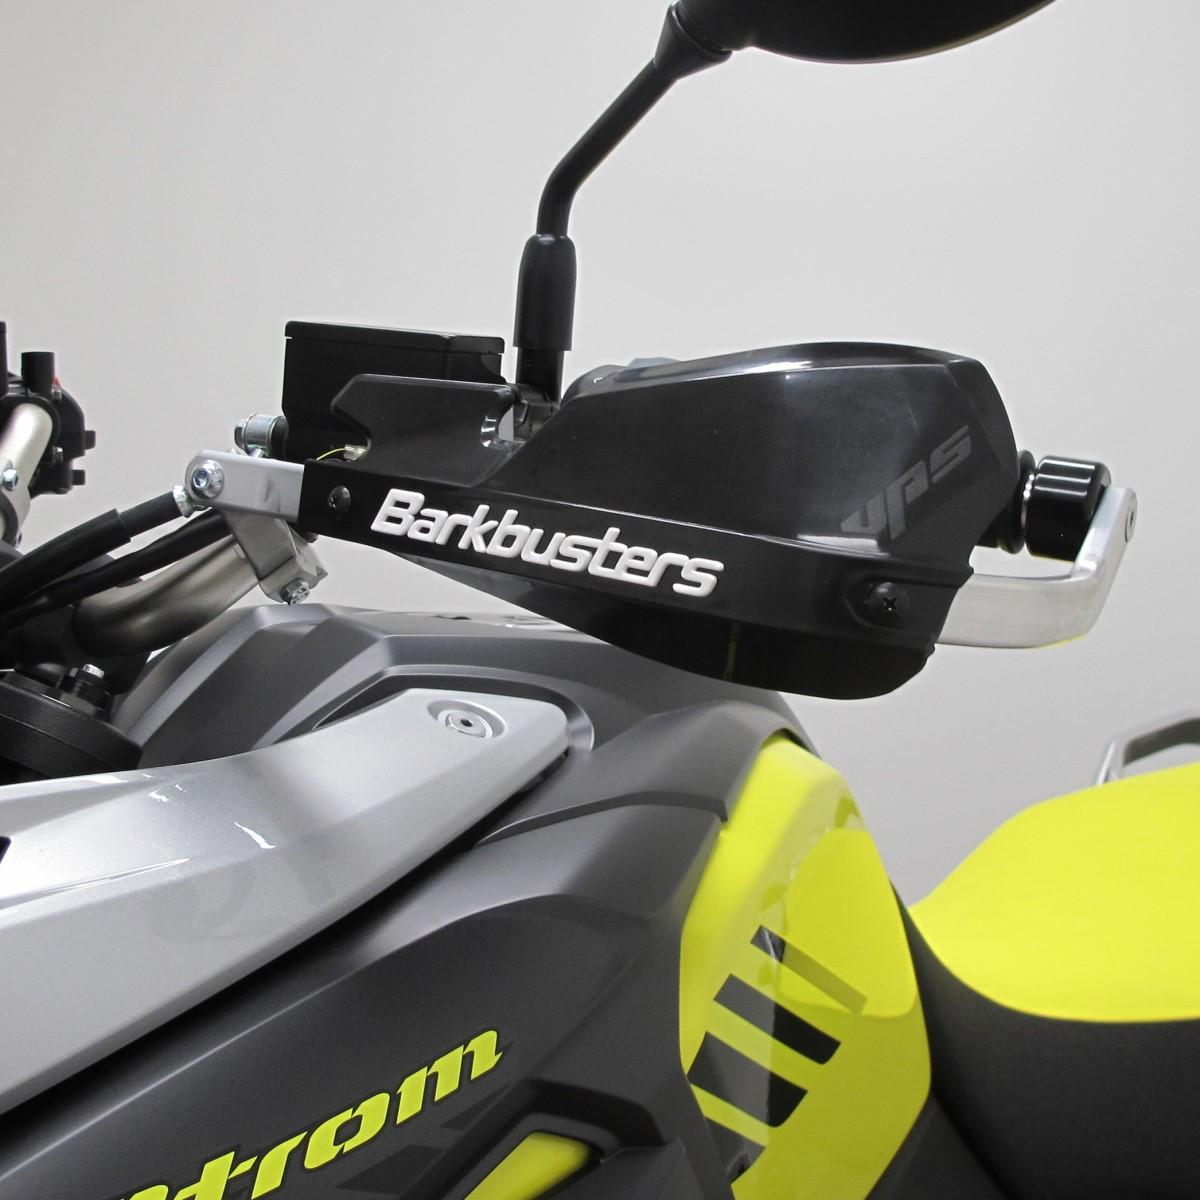 Barkbusters Bike Specific Hardware Kit For SUZUKI